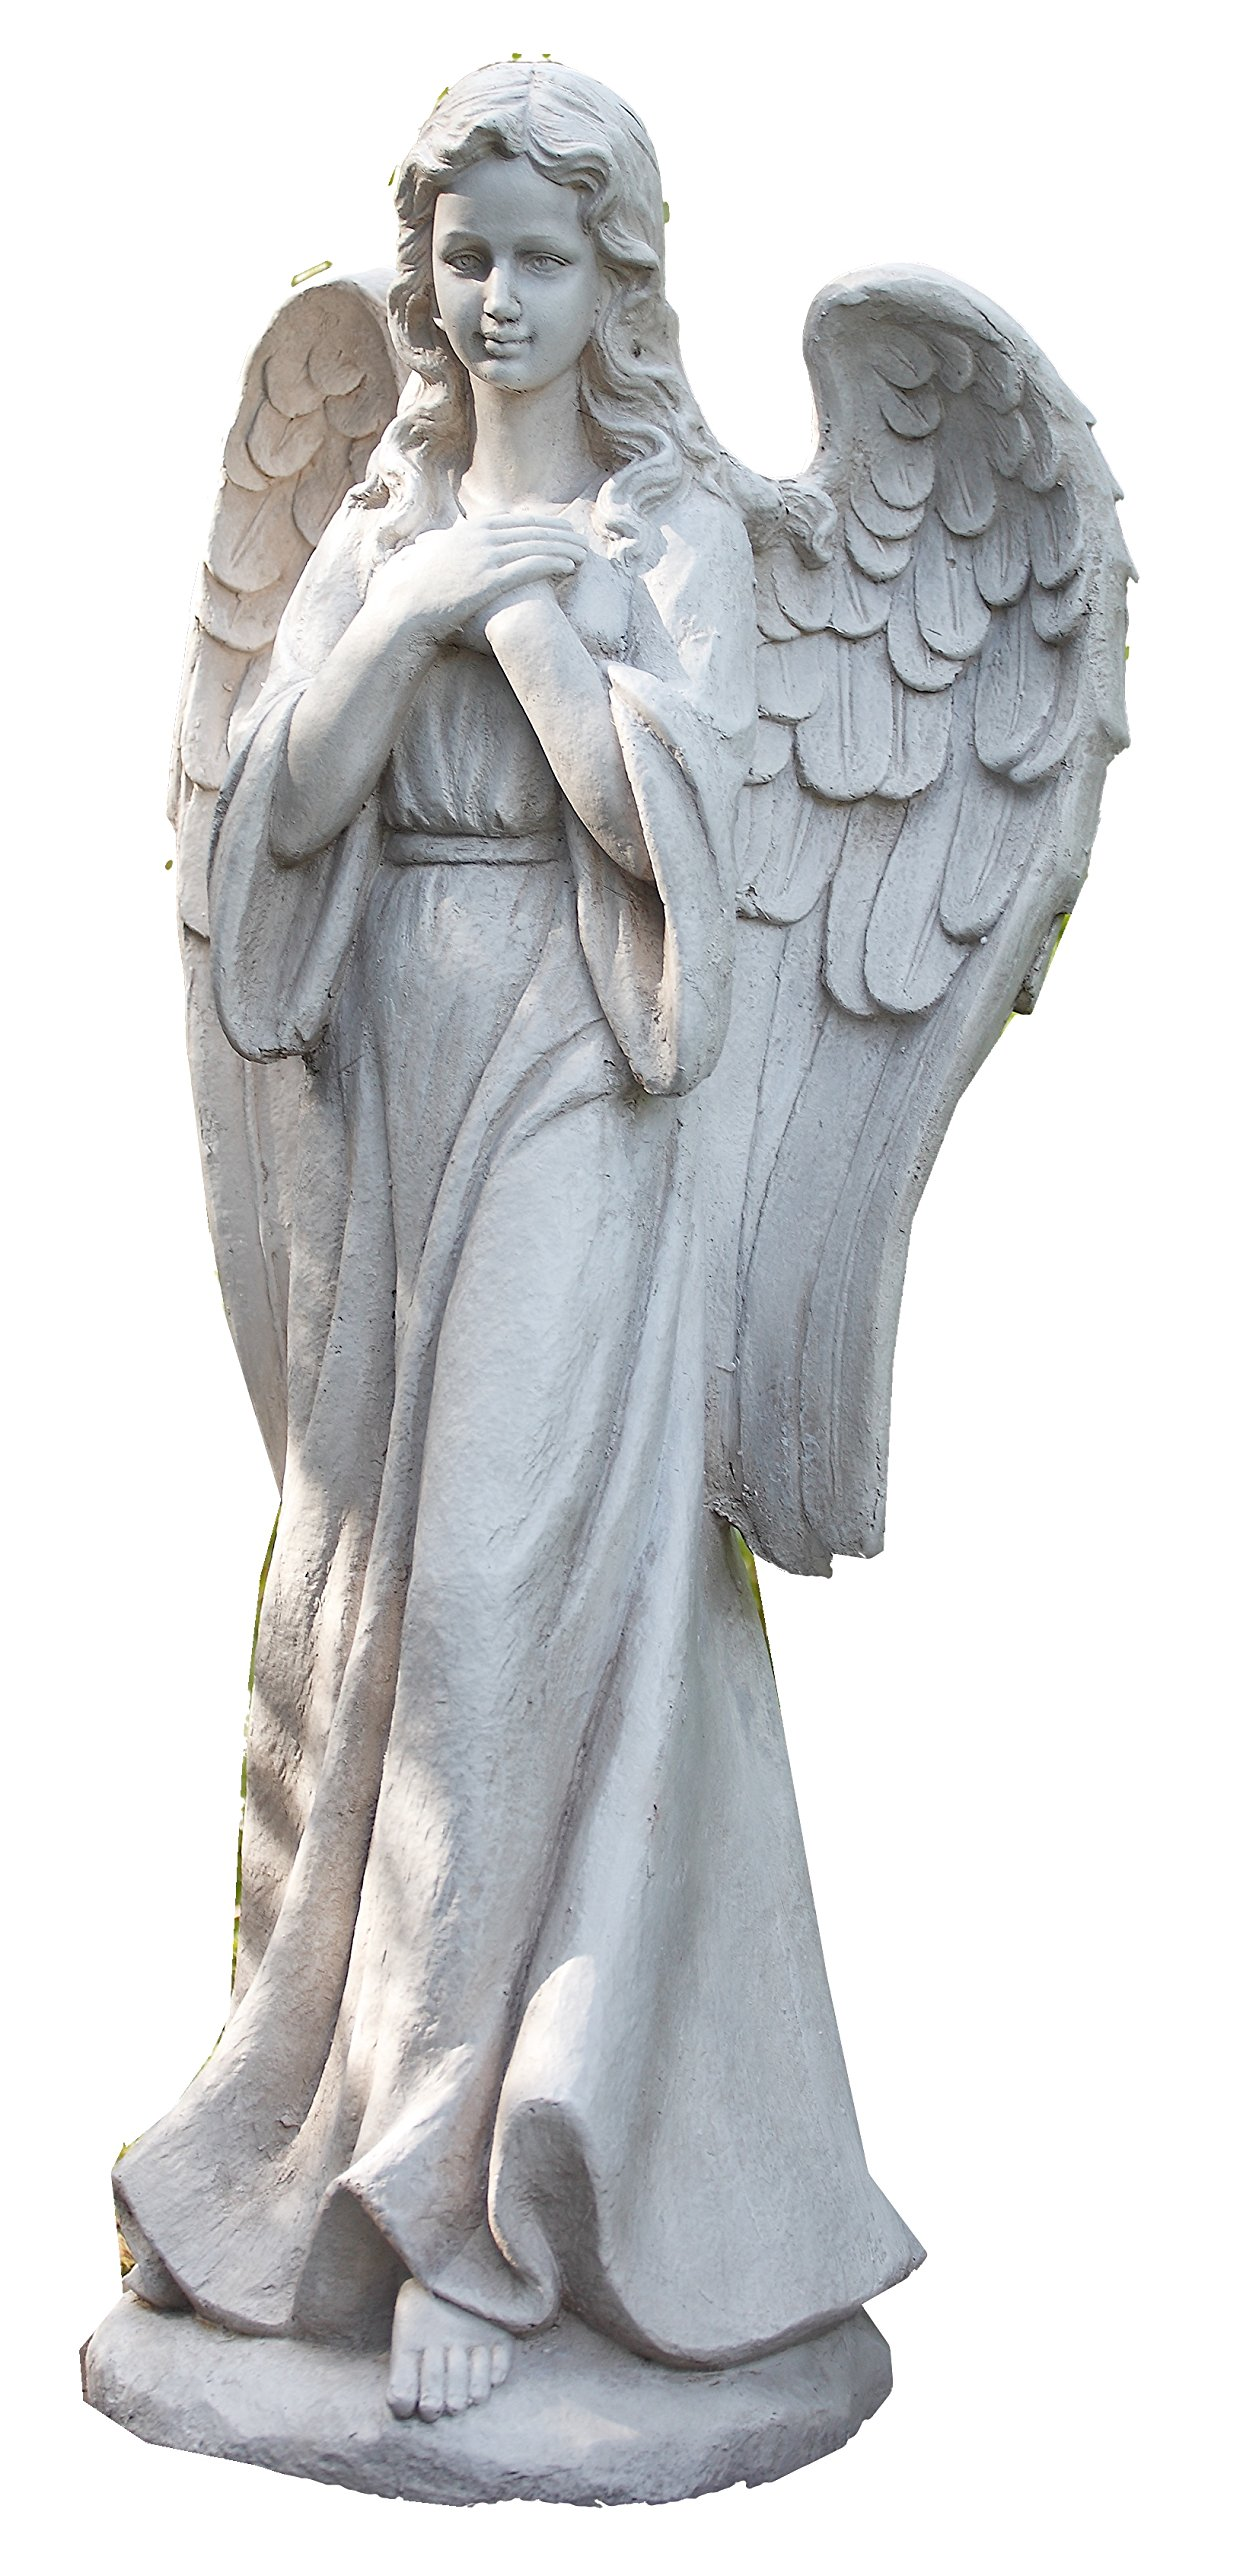 Napco 17968 Tall Praying Angel Garden Statue, 32.25''